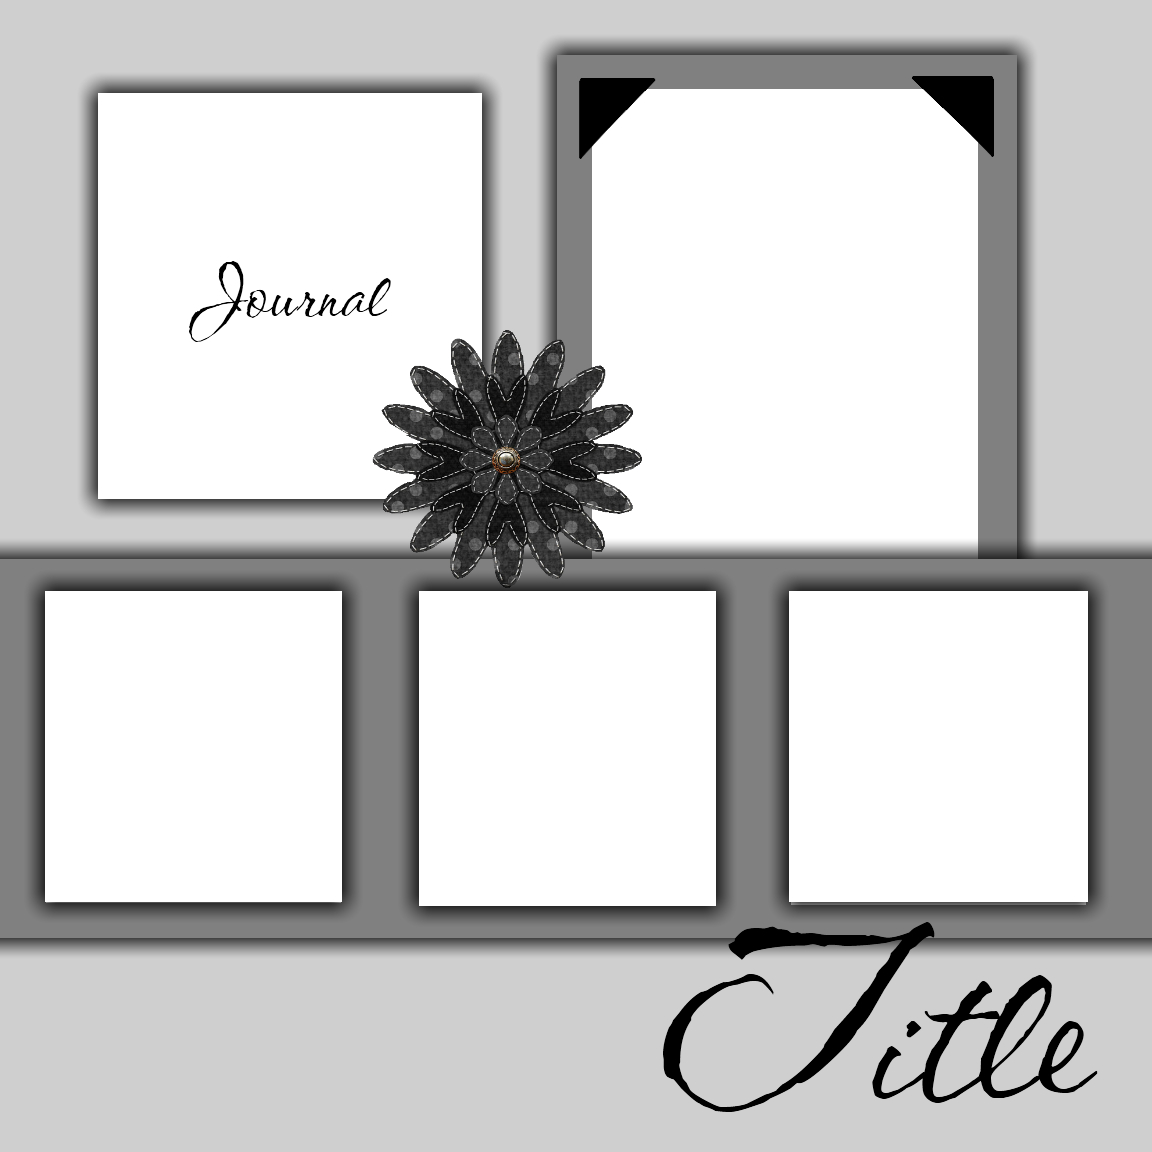 Free Printable Scrapbook Layout Templates | Free Scrapbook Templates - Free Printable Scrapbook Page Designs